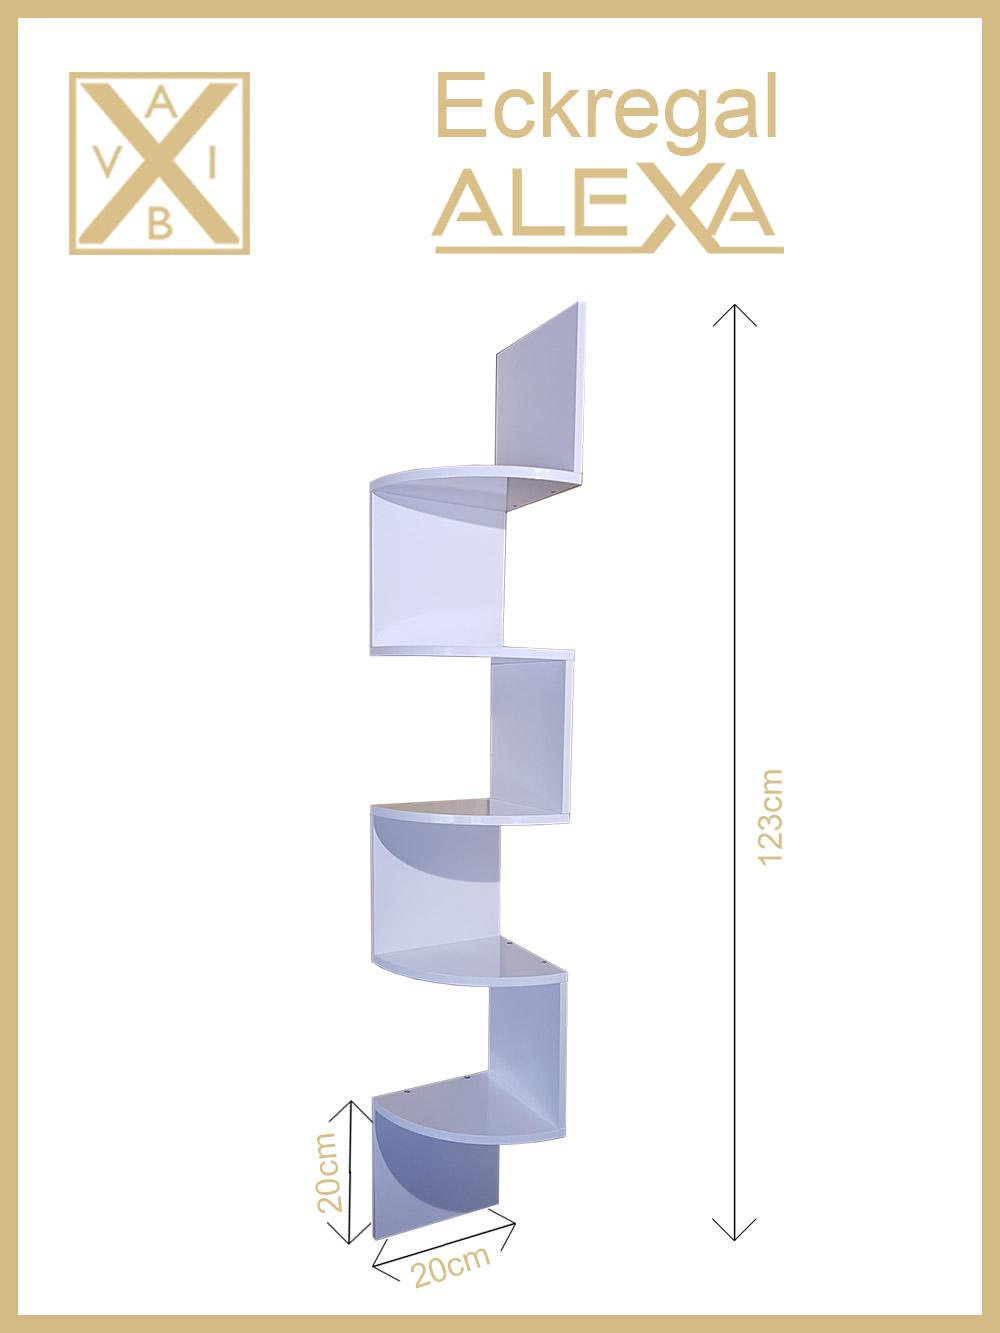 eckregal alexa hochglanz in versch farben aibv trade gmbh. Black Bedroom Furniture Sets. Home Design Ideas